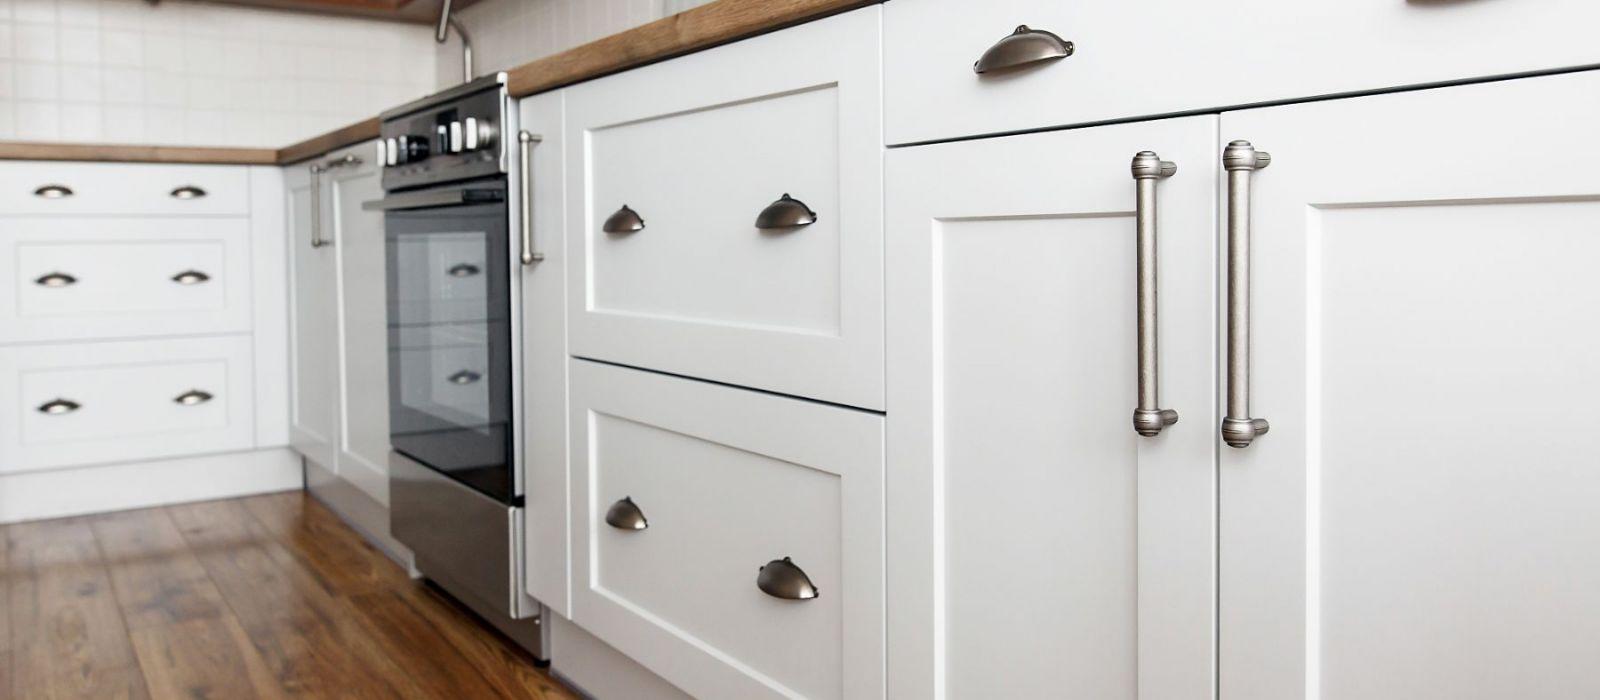 Frugal Kitchens Cabinet Options